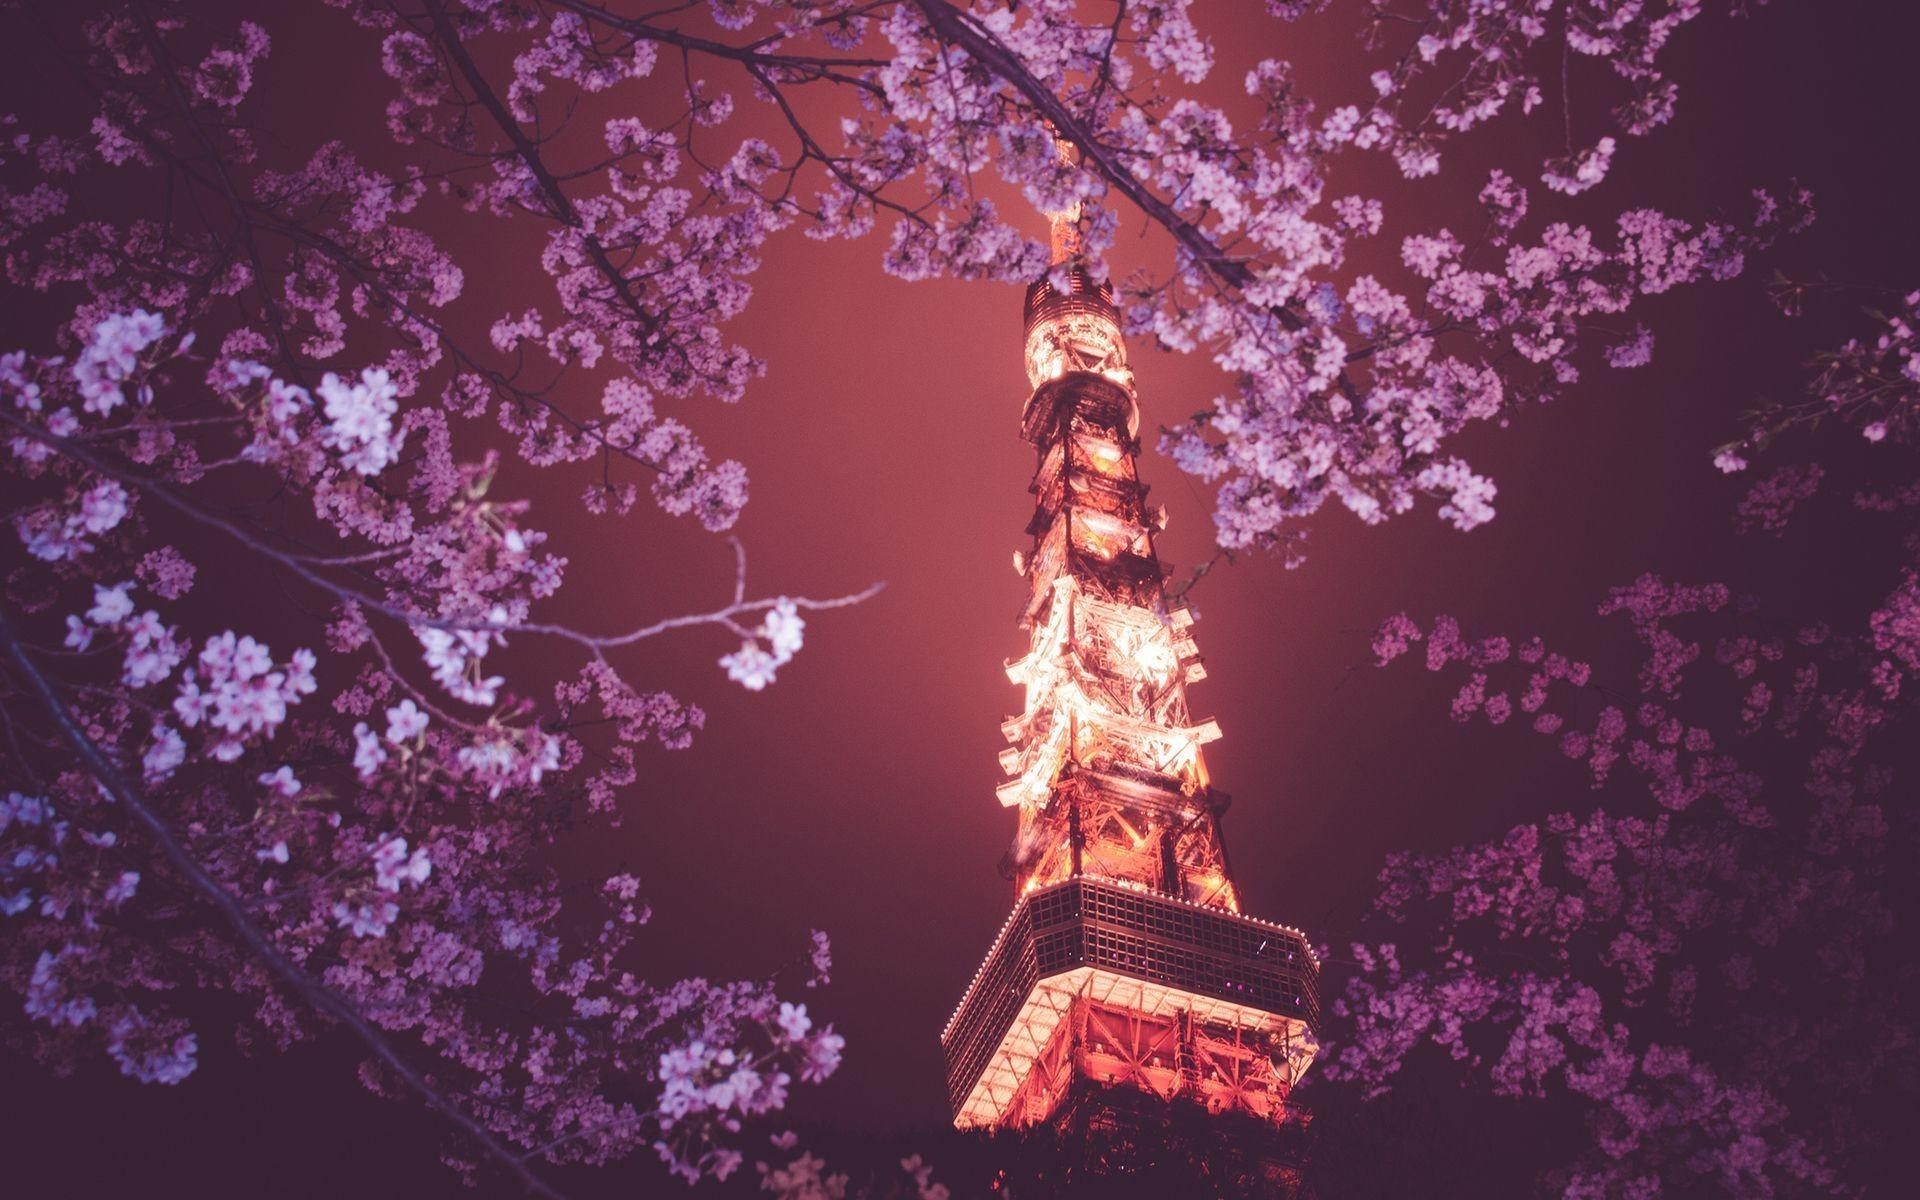 Cool Wallpaper Night Cherry Blossom - Japan-flowers-night-branch-cherry-blossom-blossom-spring-Tokyo-Tokyo-Tower-flower-plant-computer-wallpaper-91748  Photograph.jpg